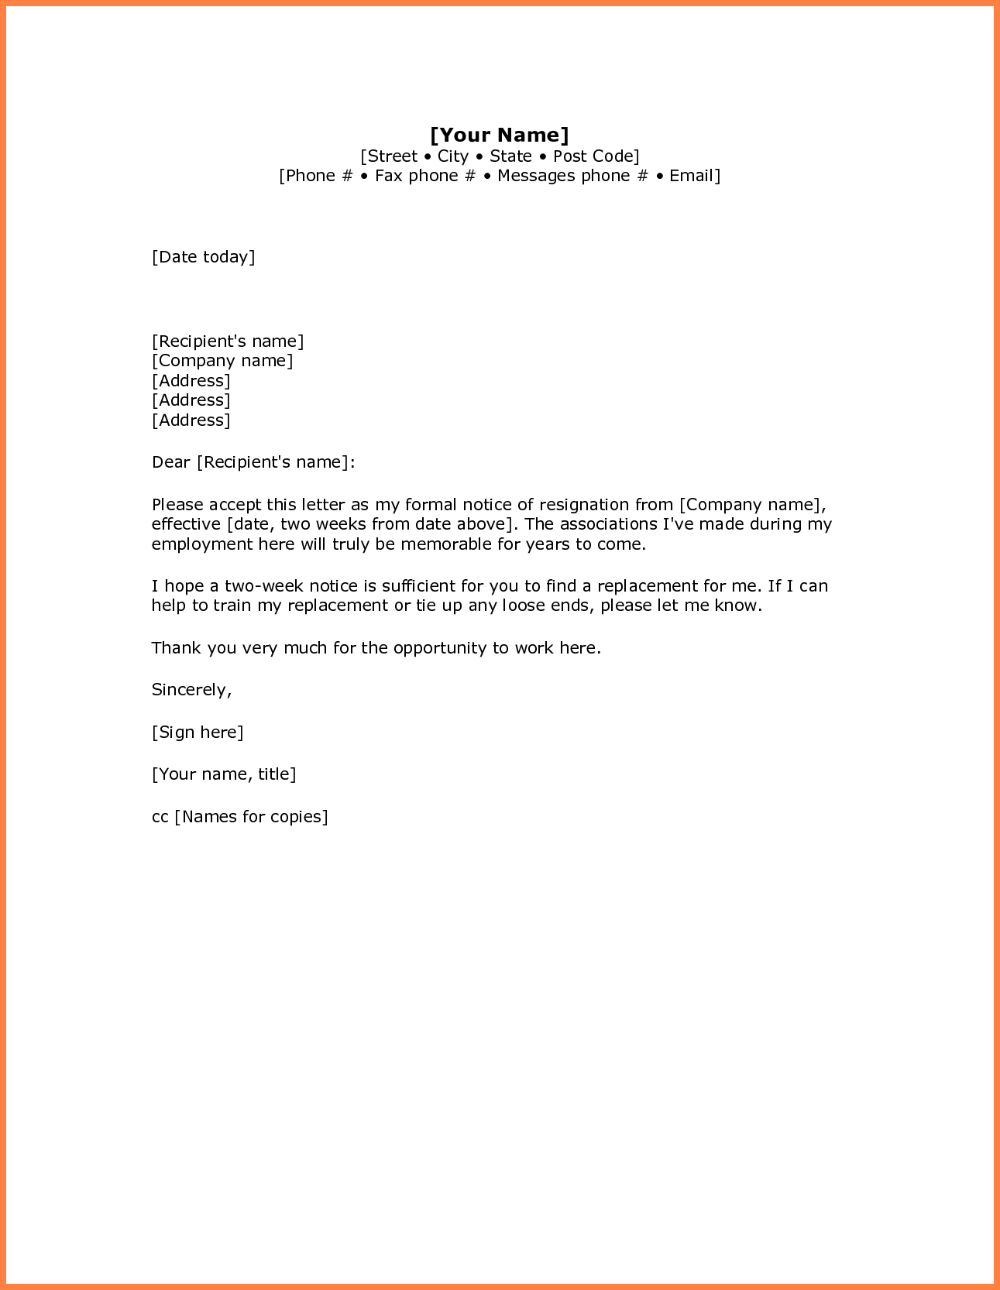 simple resignation letter sample week notice entry level cnc machinist resume medical device assembler best retail